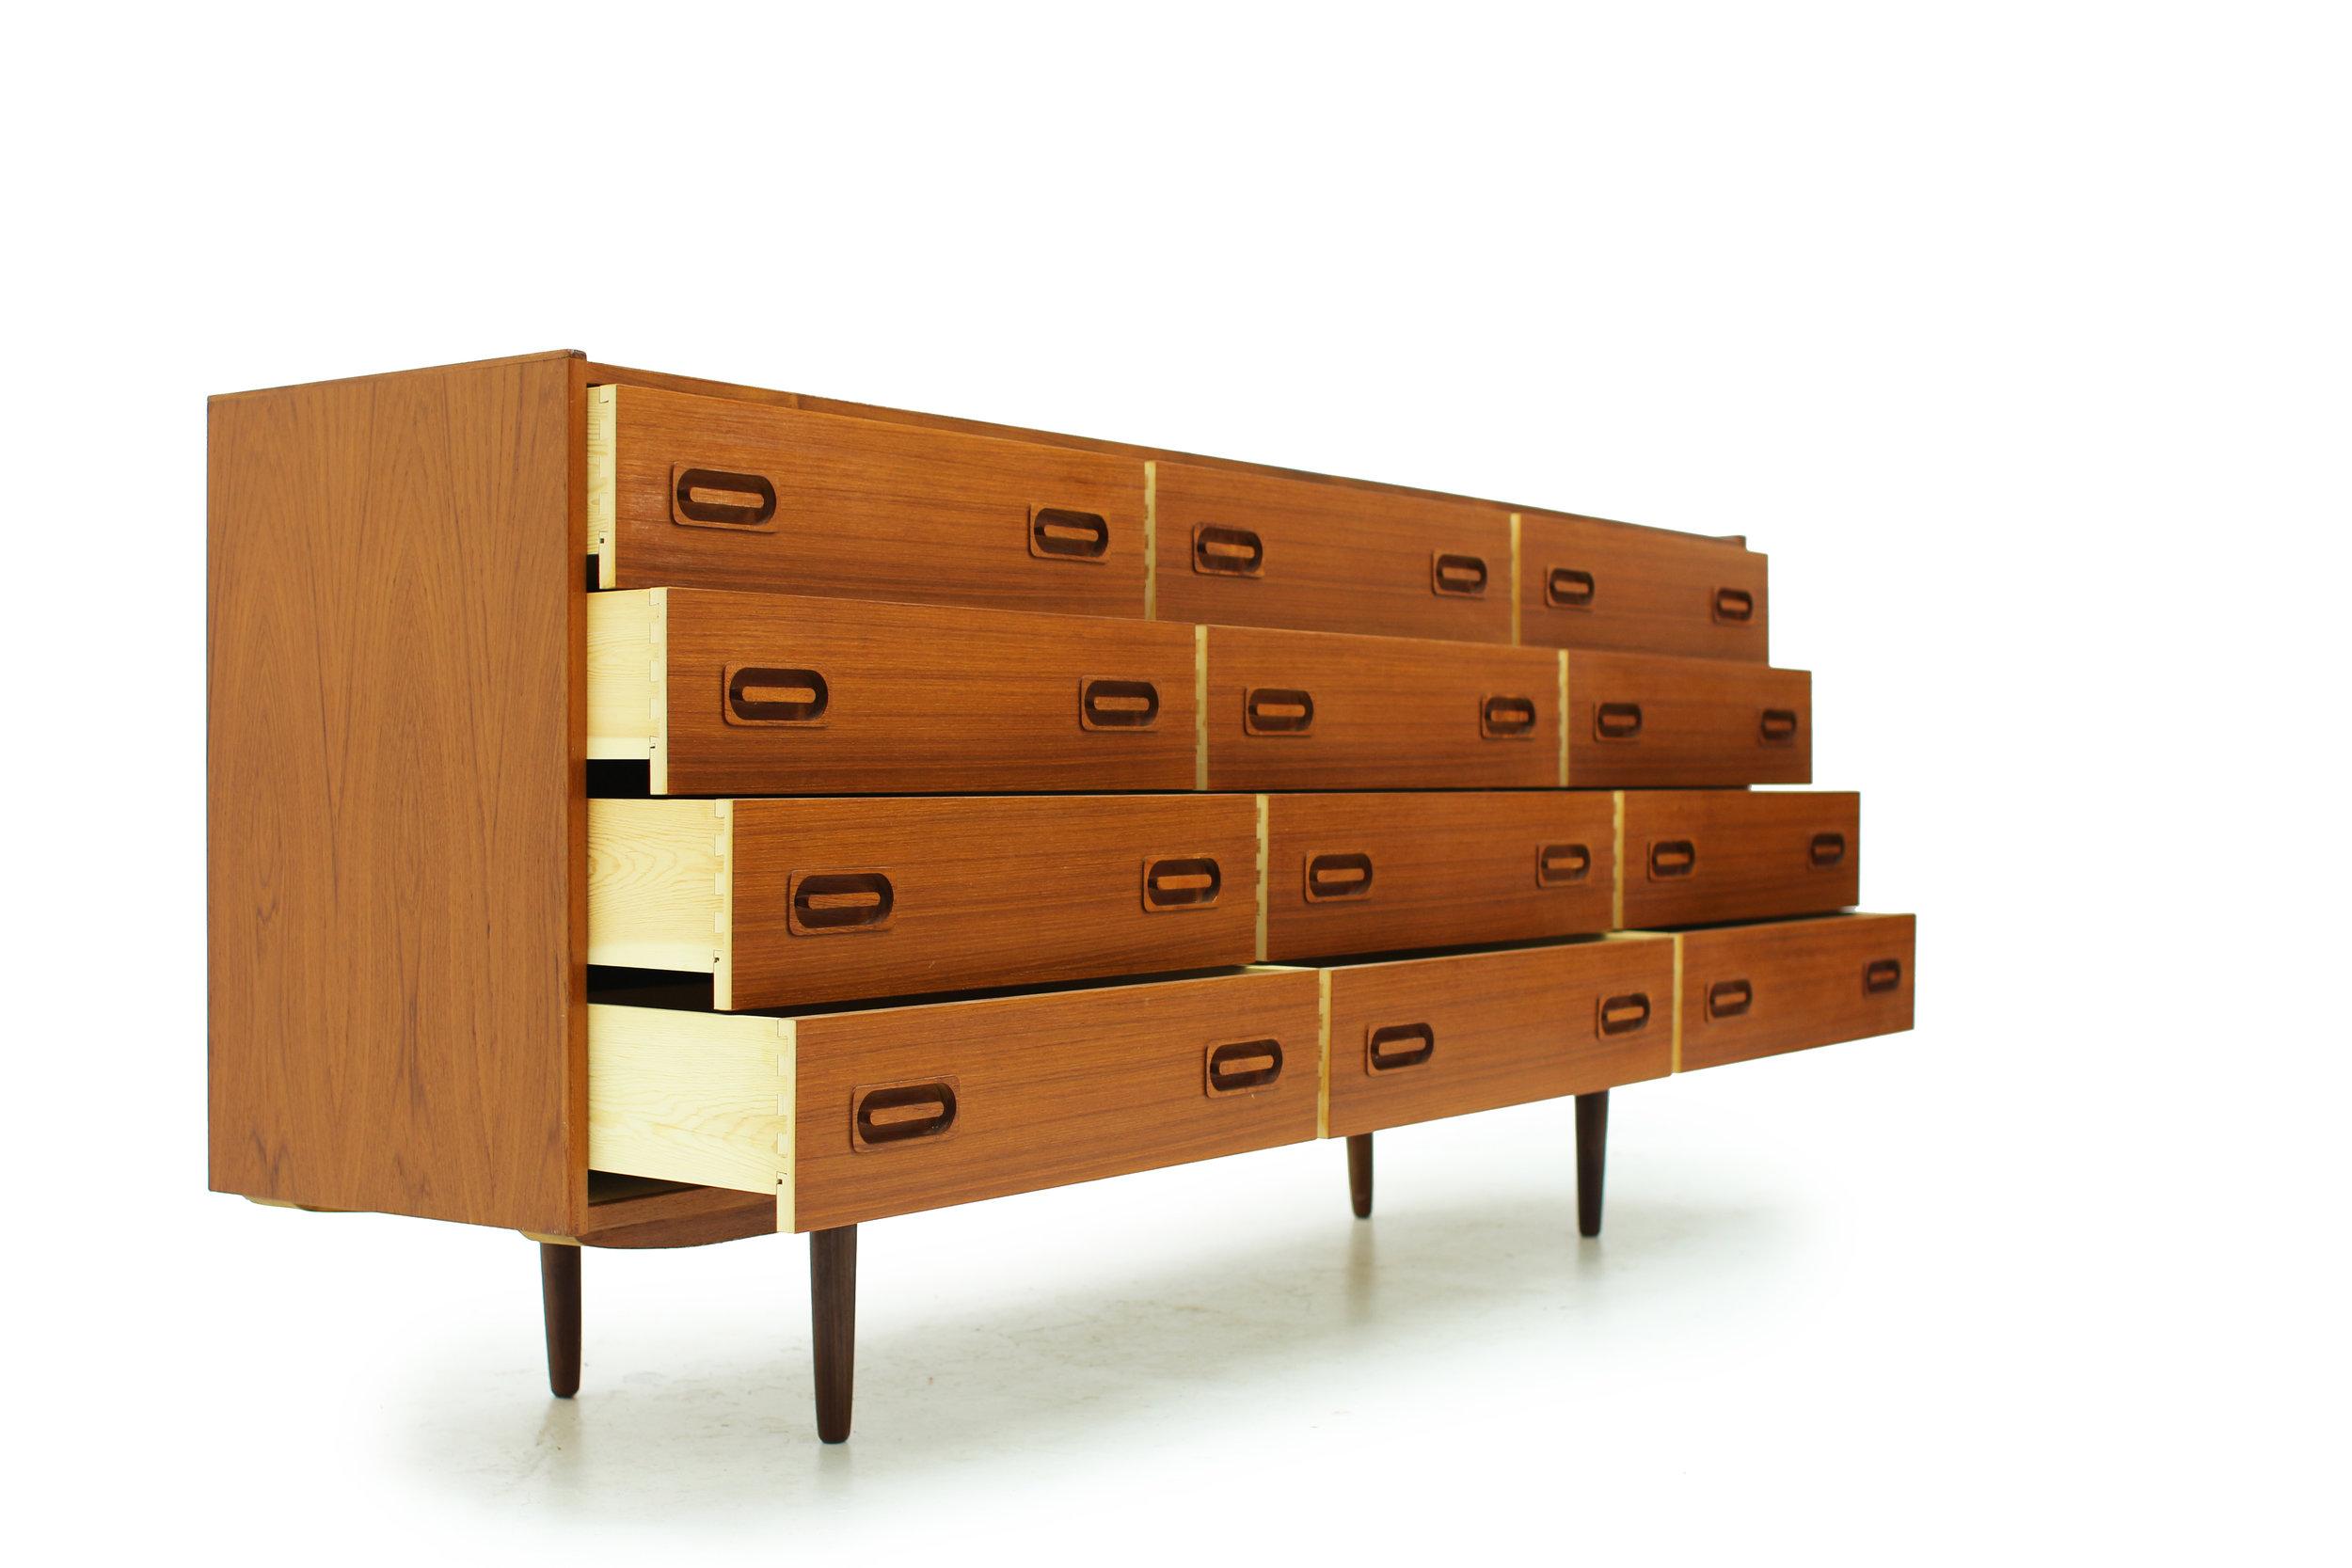 Danish Teak 12 Drawer Dresser by Dyrlund (4).jpg